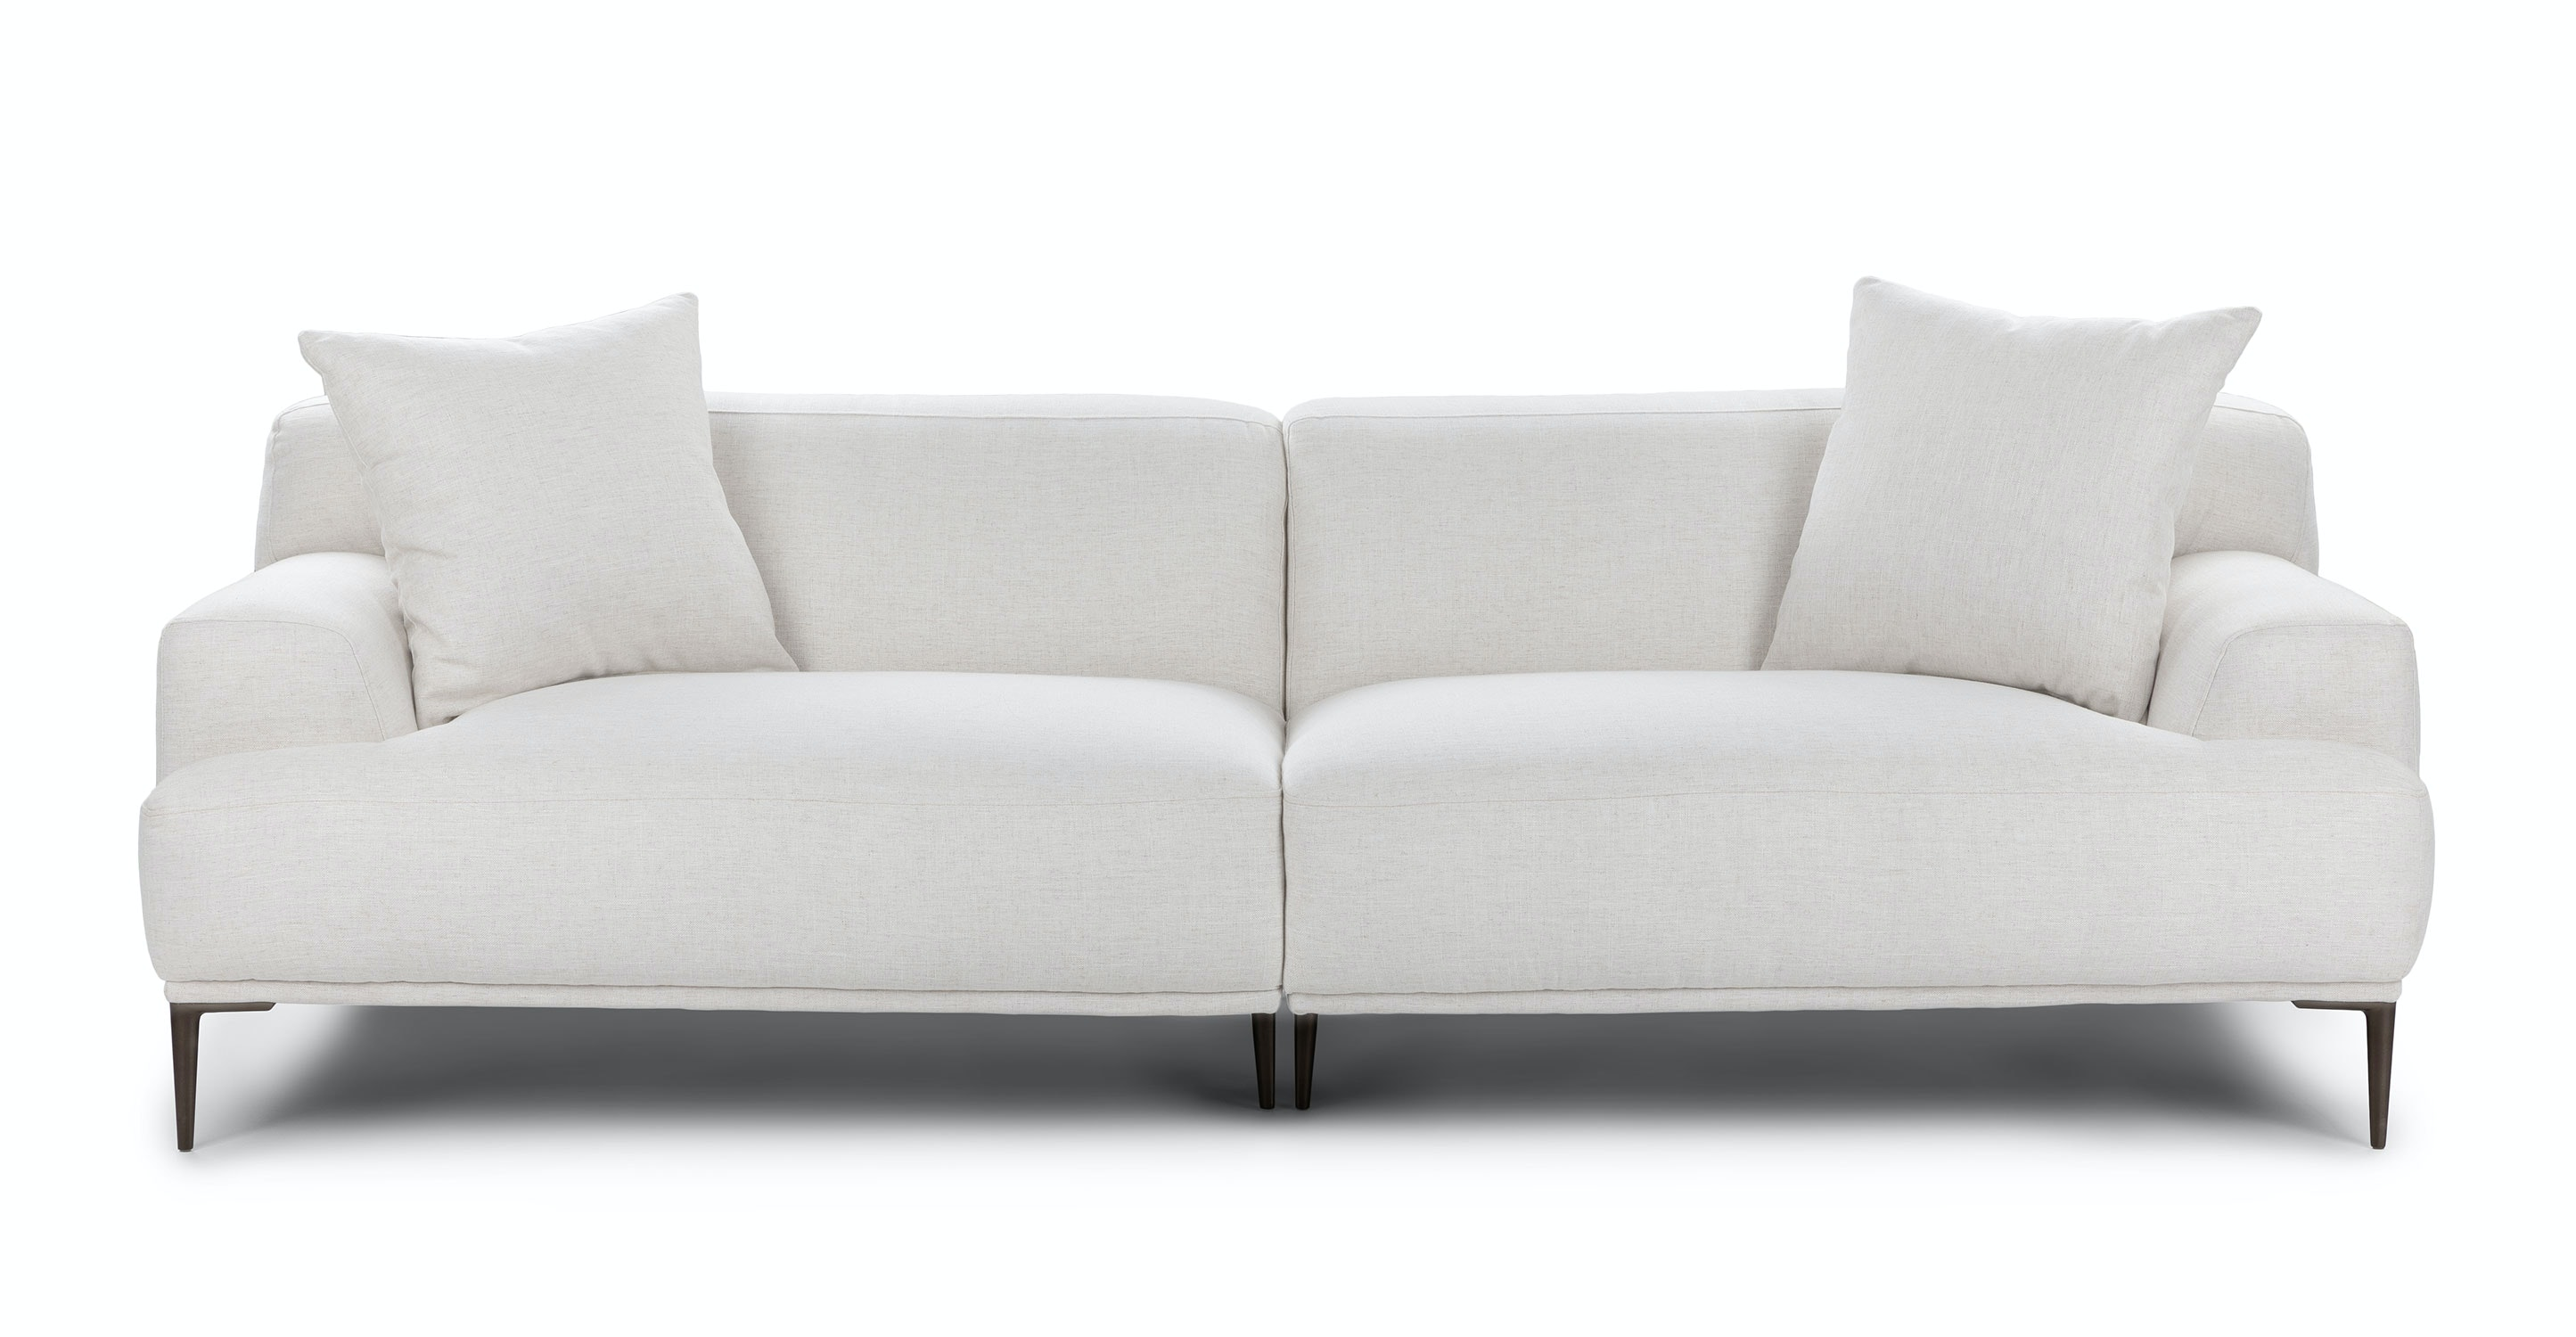 Super Abisko Quartz White Sofa Theyellowbook Wood Chair Design Ideas Theyellowbookinfo